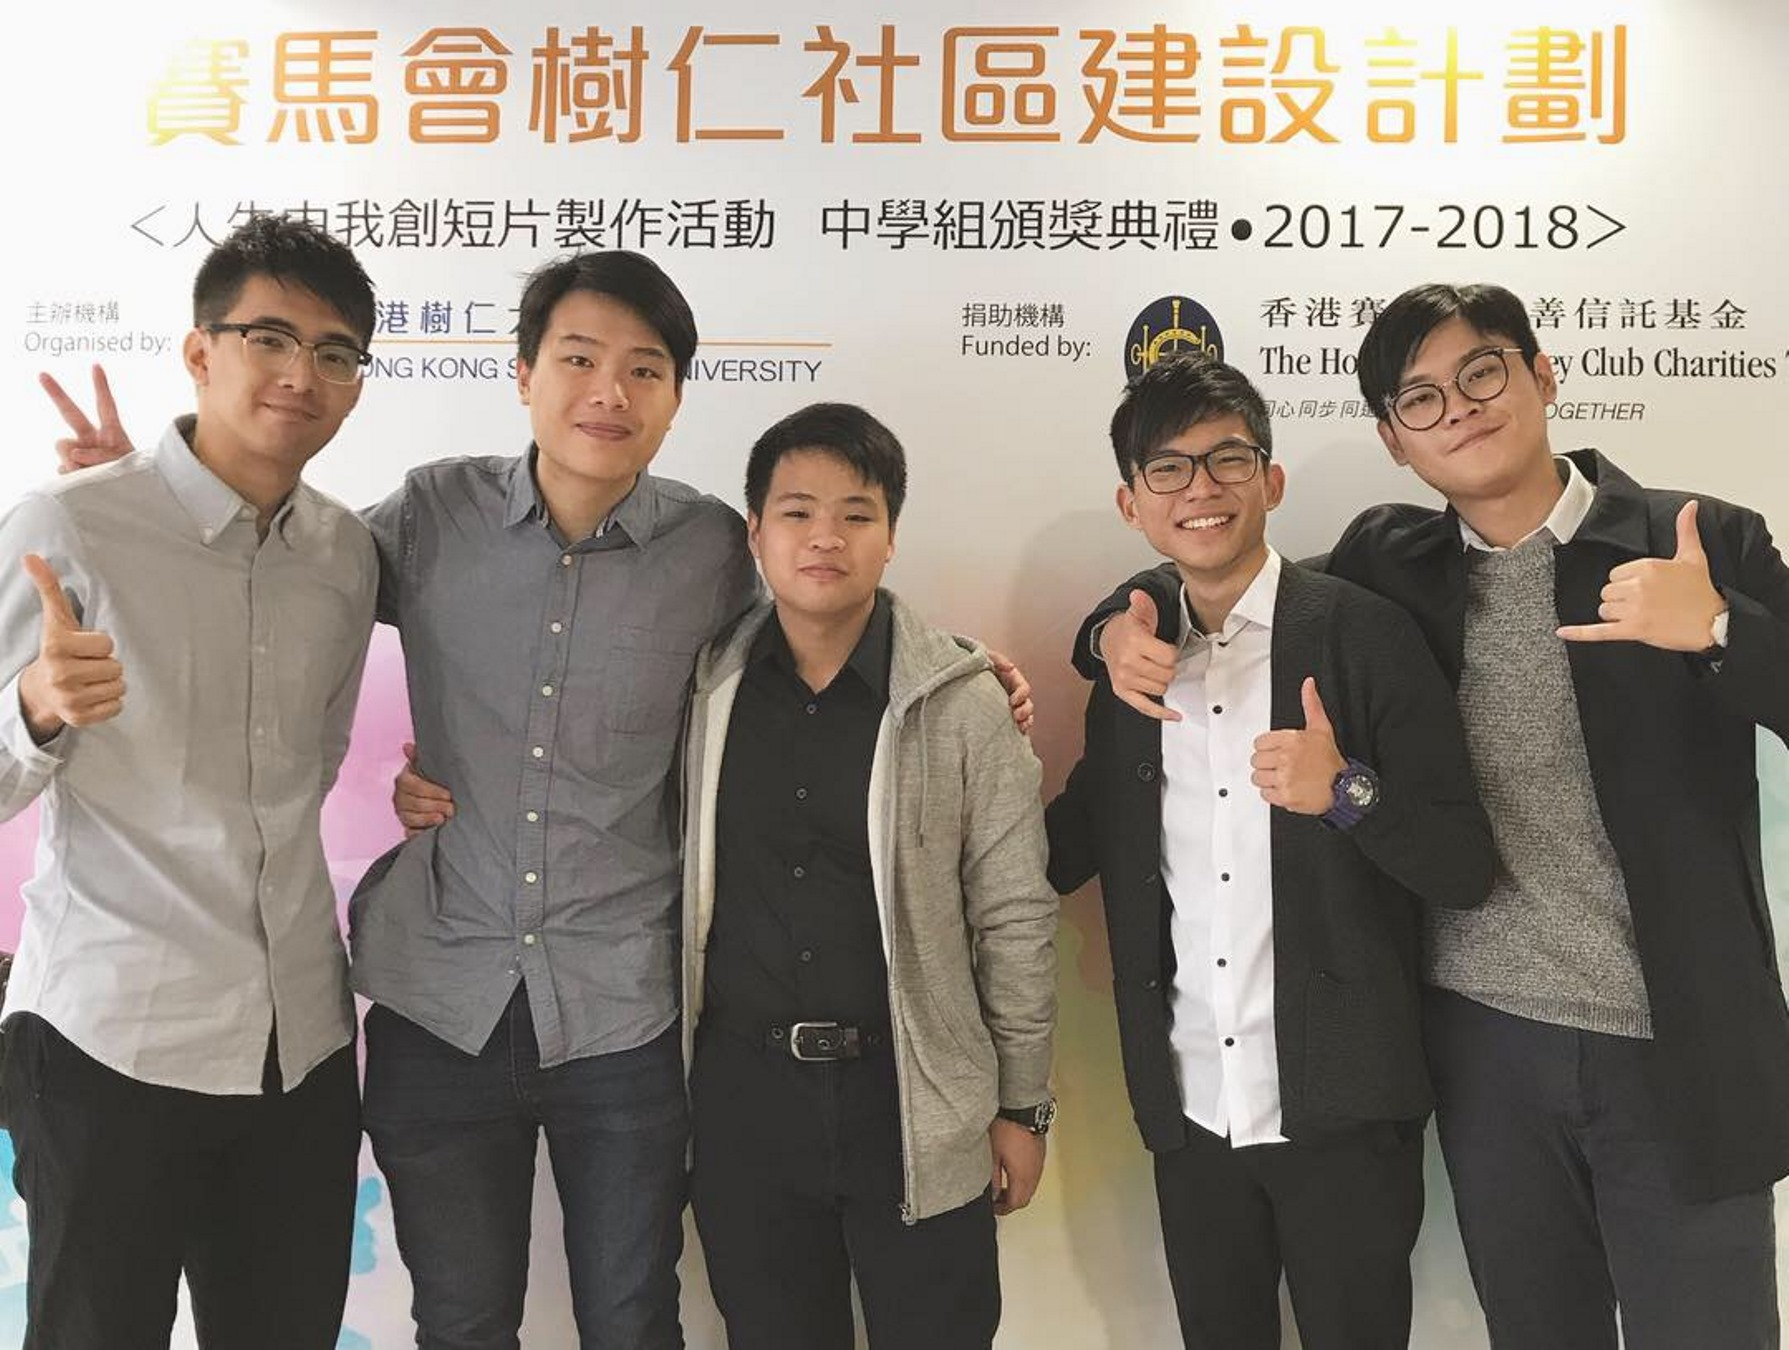 https://npc.edu.hk/sites/default/files/img-0092.jpg